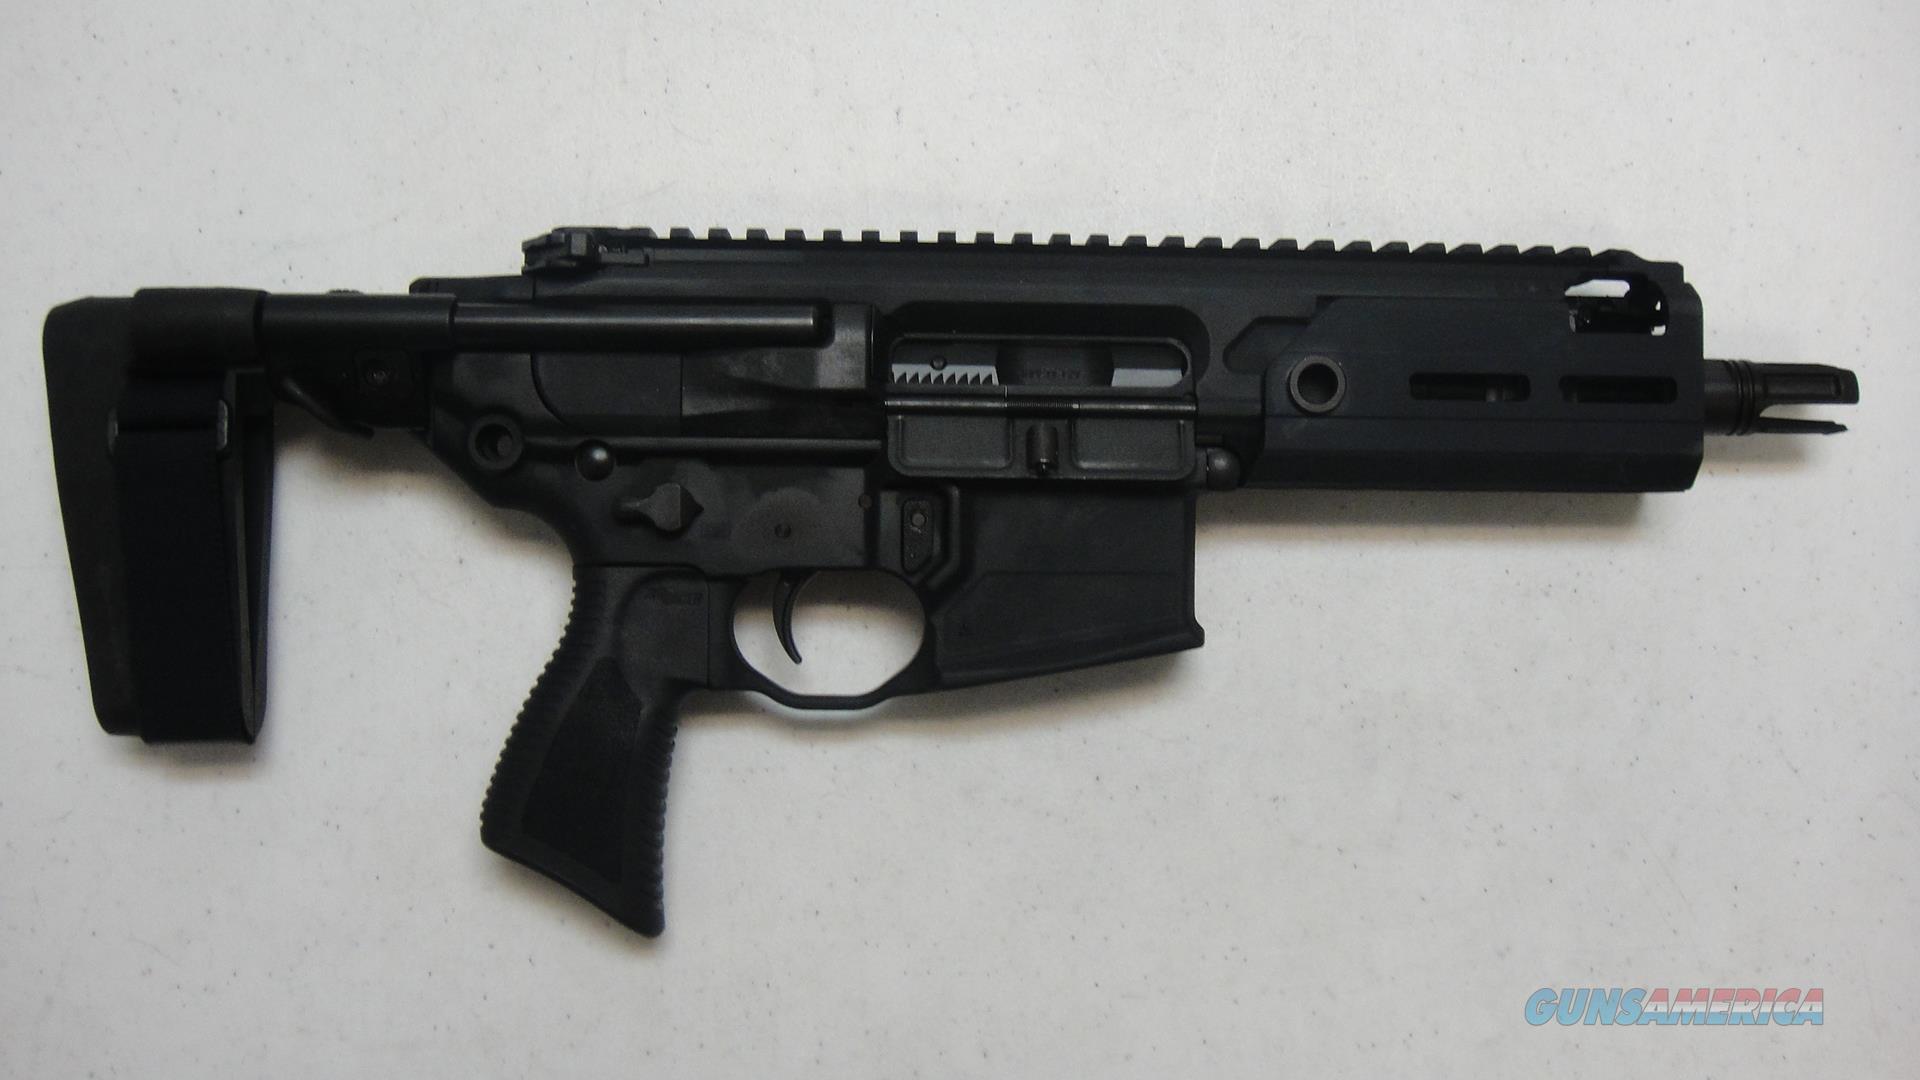 Sig Sauer MCX Rattler w/arm brace  Guns > Pistols > Sig - Sauer/Sigarms Pistols > Other